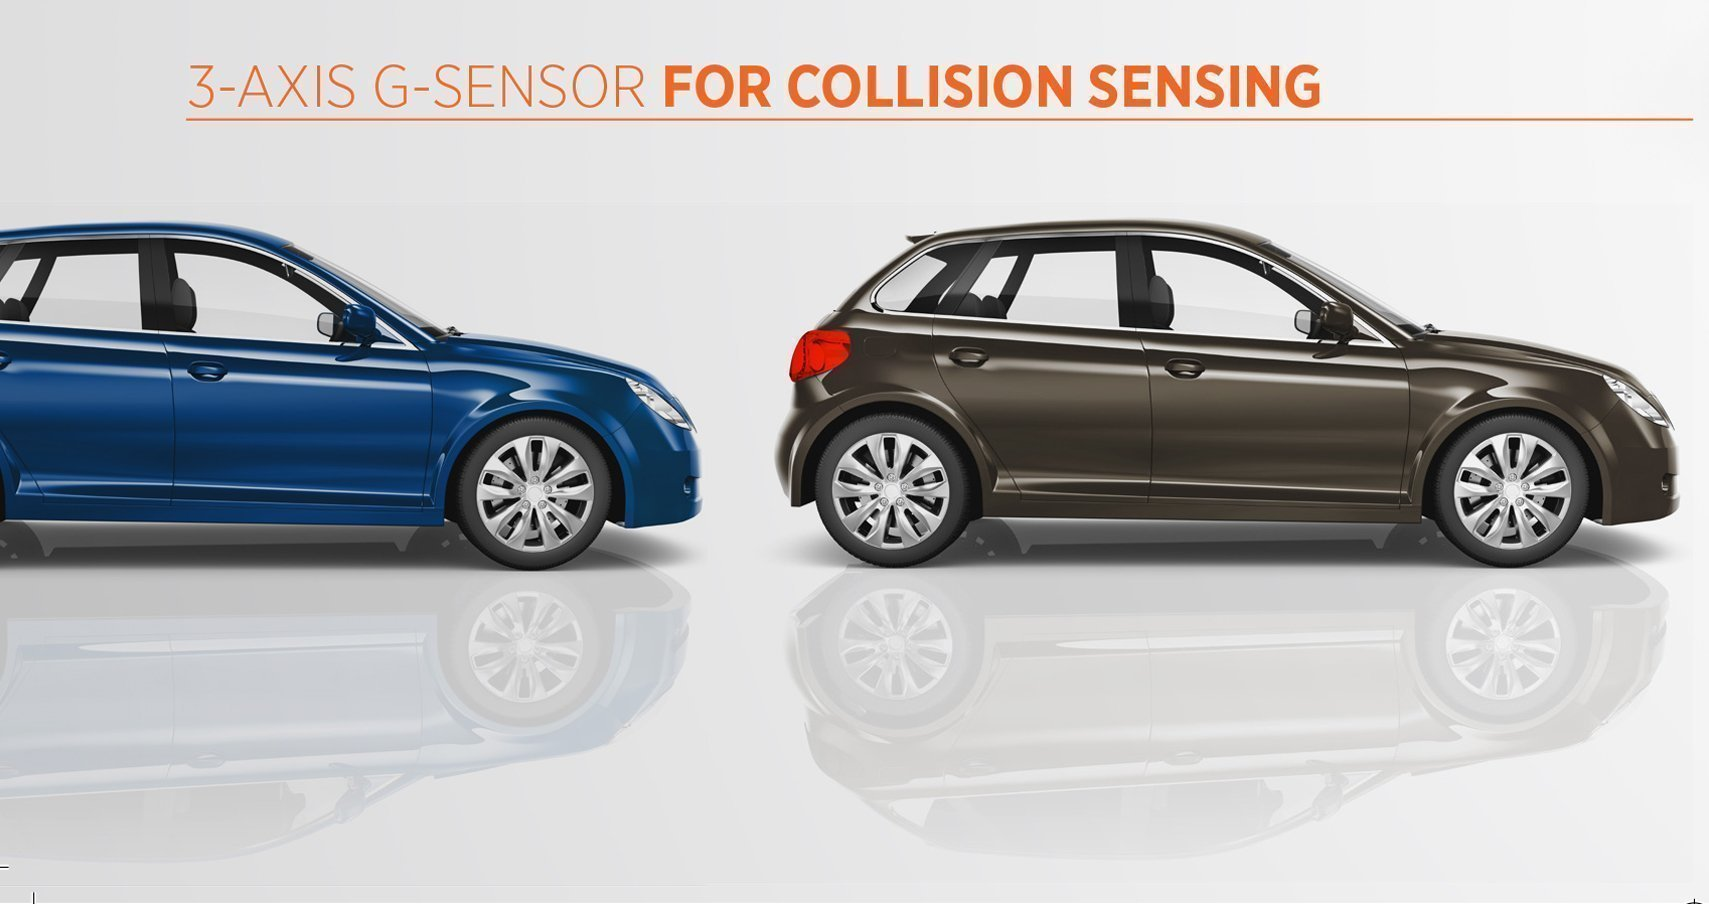 Dash Cam with Collision Sensor